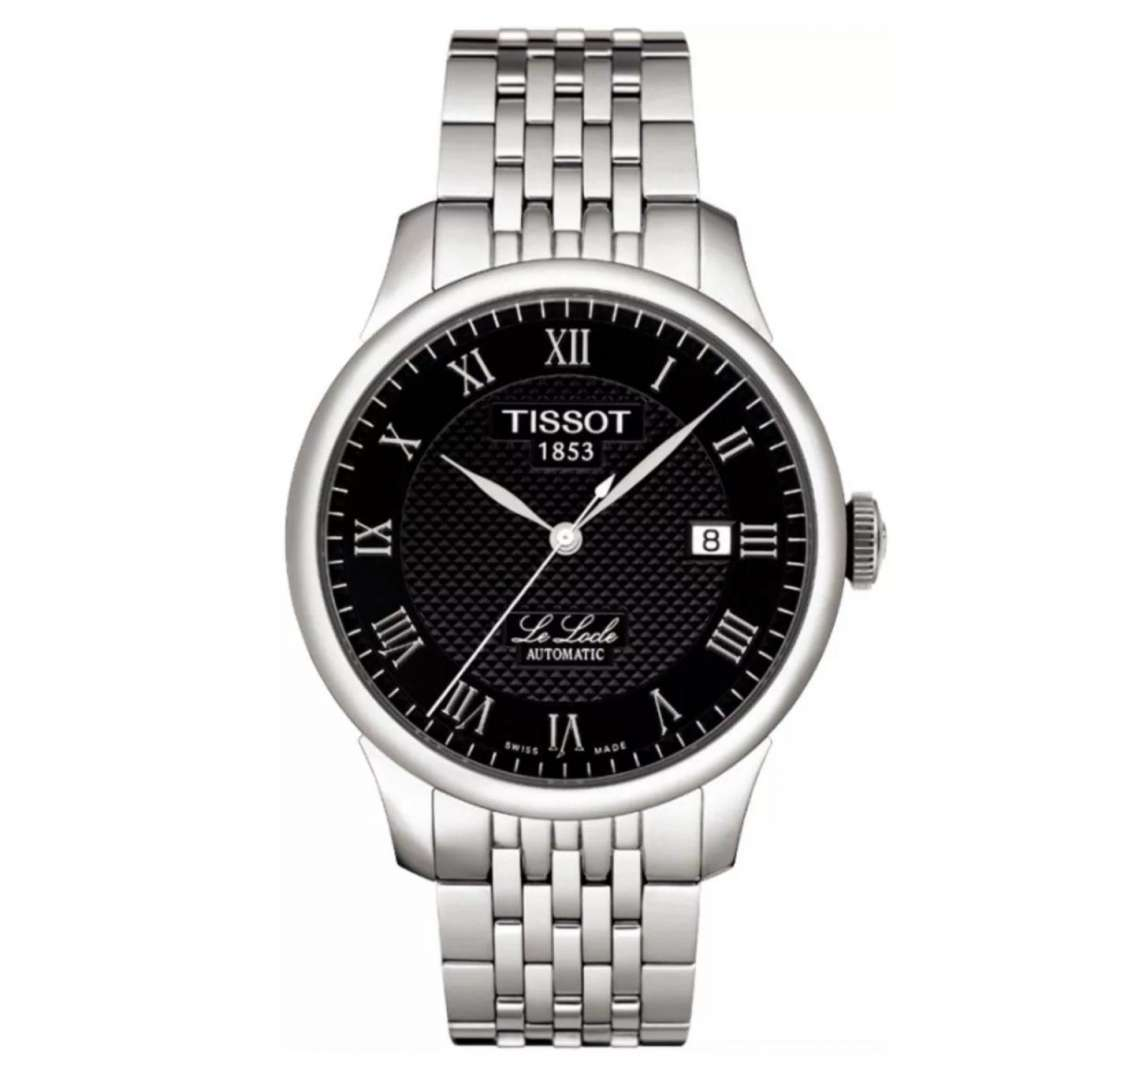 שעון יד אנלוגי tissot t41.1.483.53 טיסו